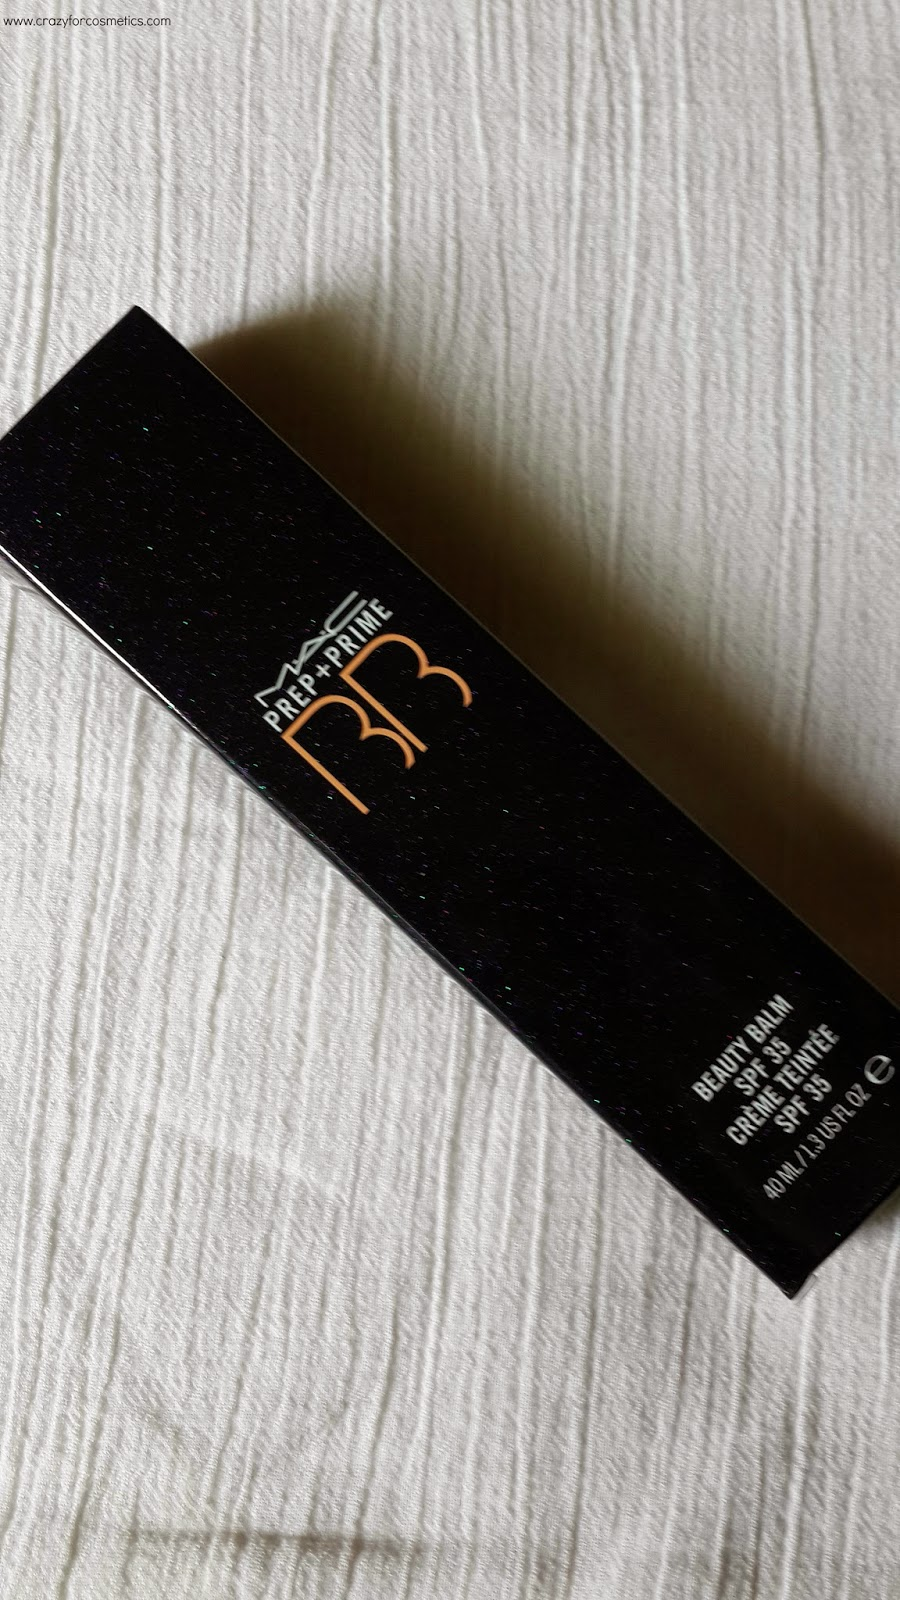 mac prep and prime,mac bb cream,mac bb cream India, mac bb cream price india